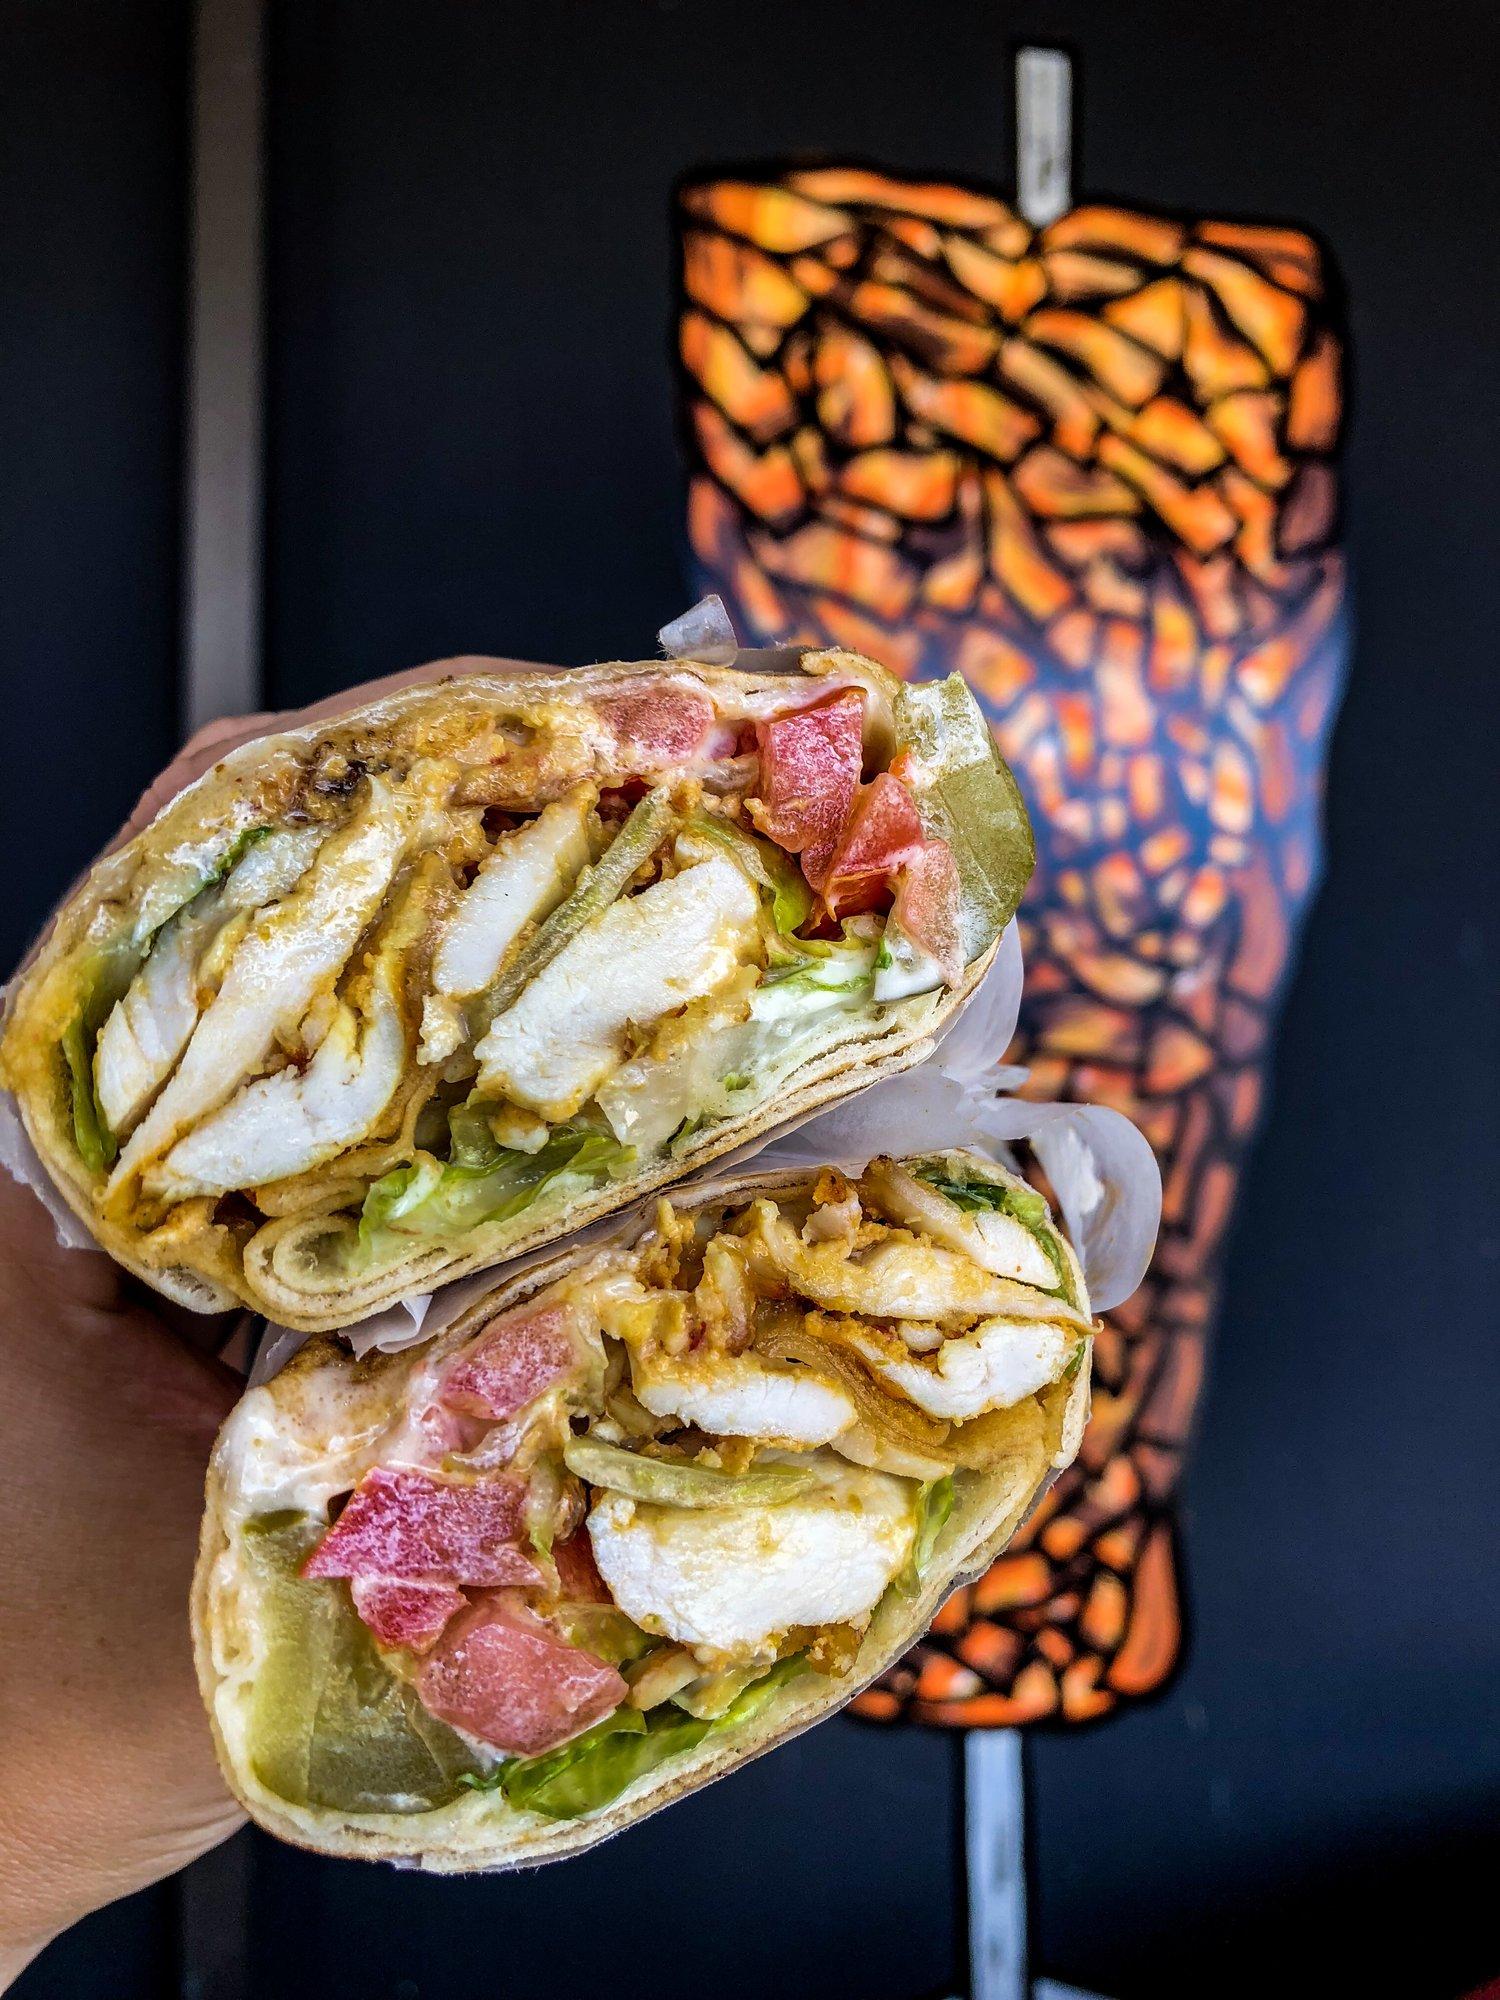 Alsafa: Halal Meat Market, and Grocery — Terabeza